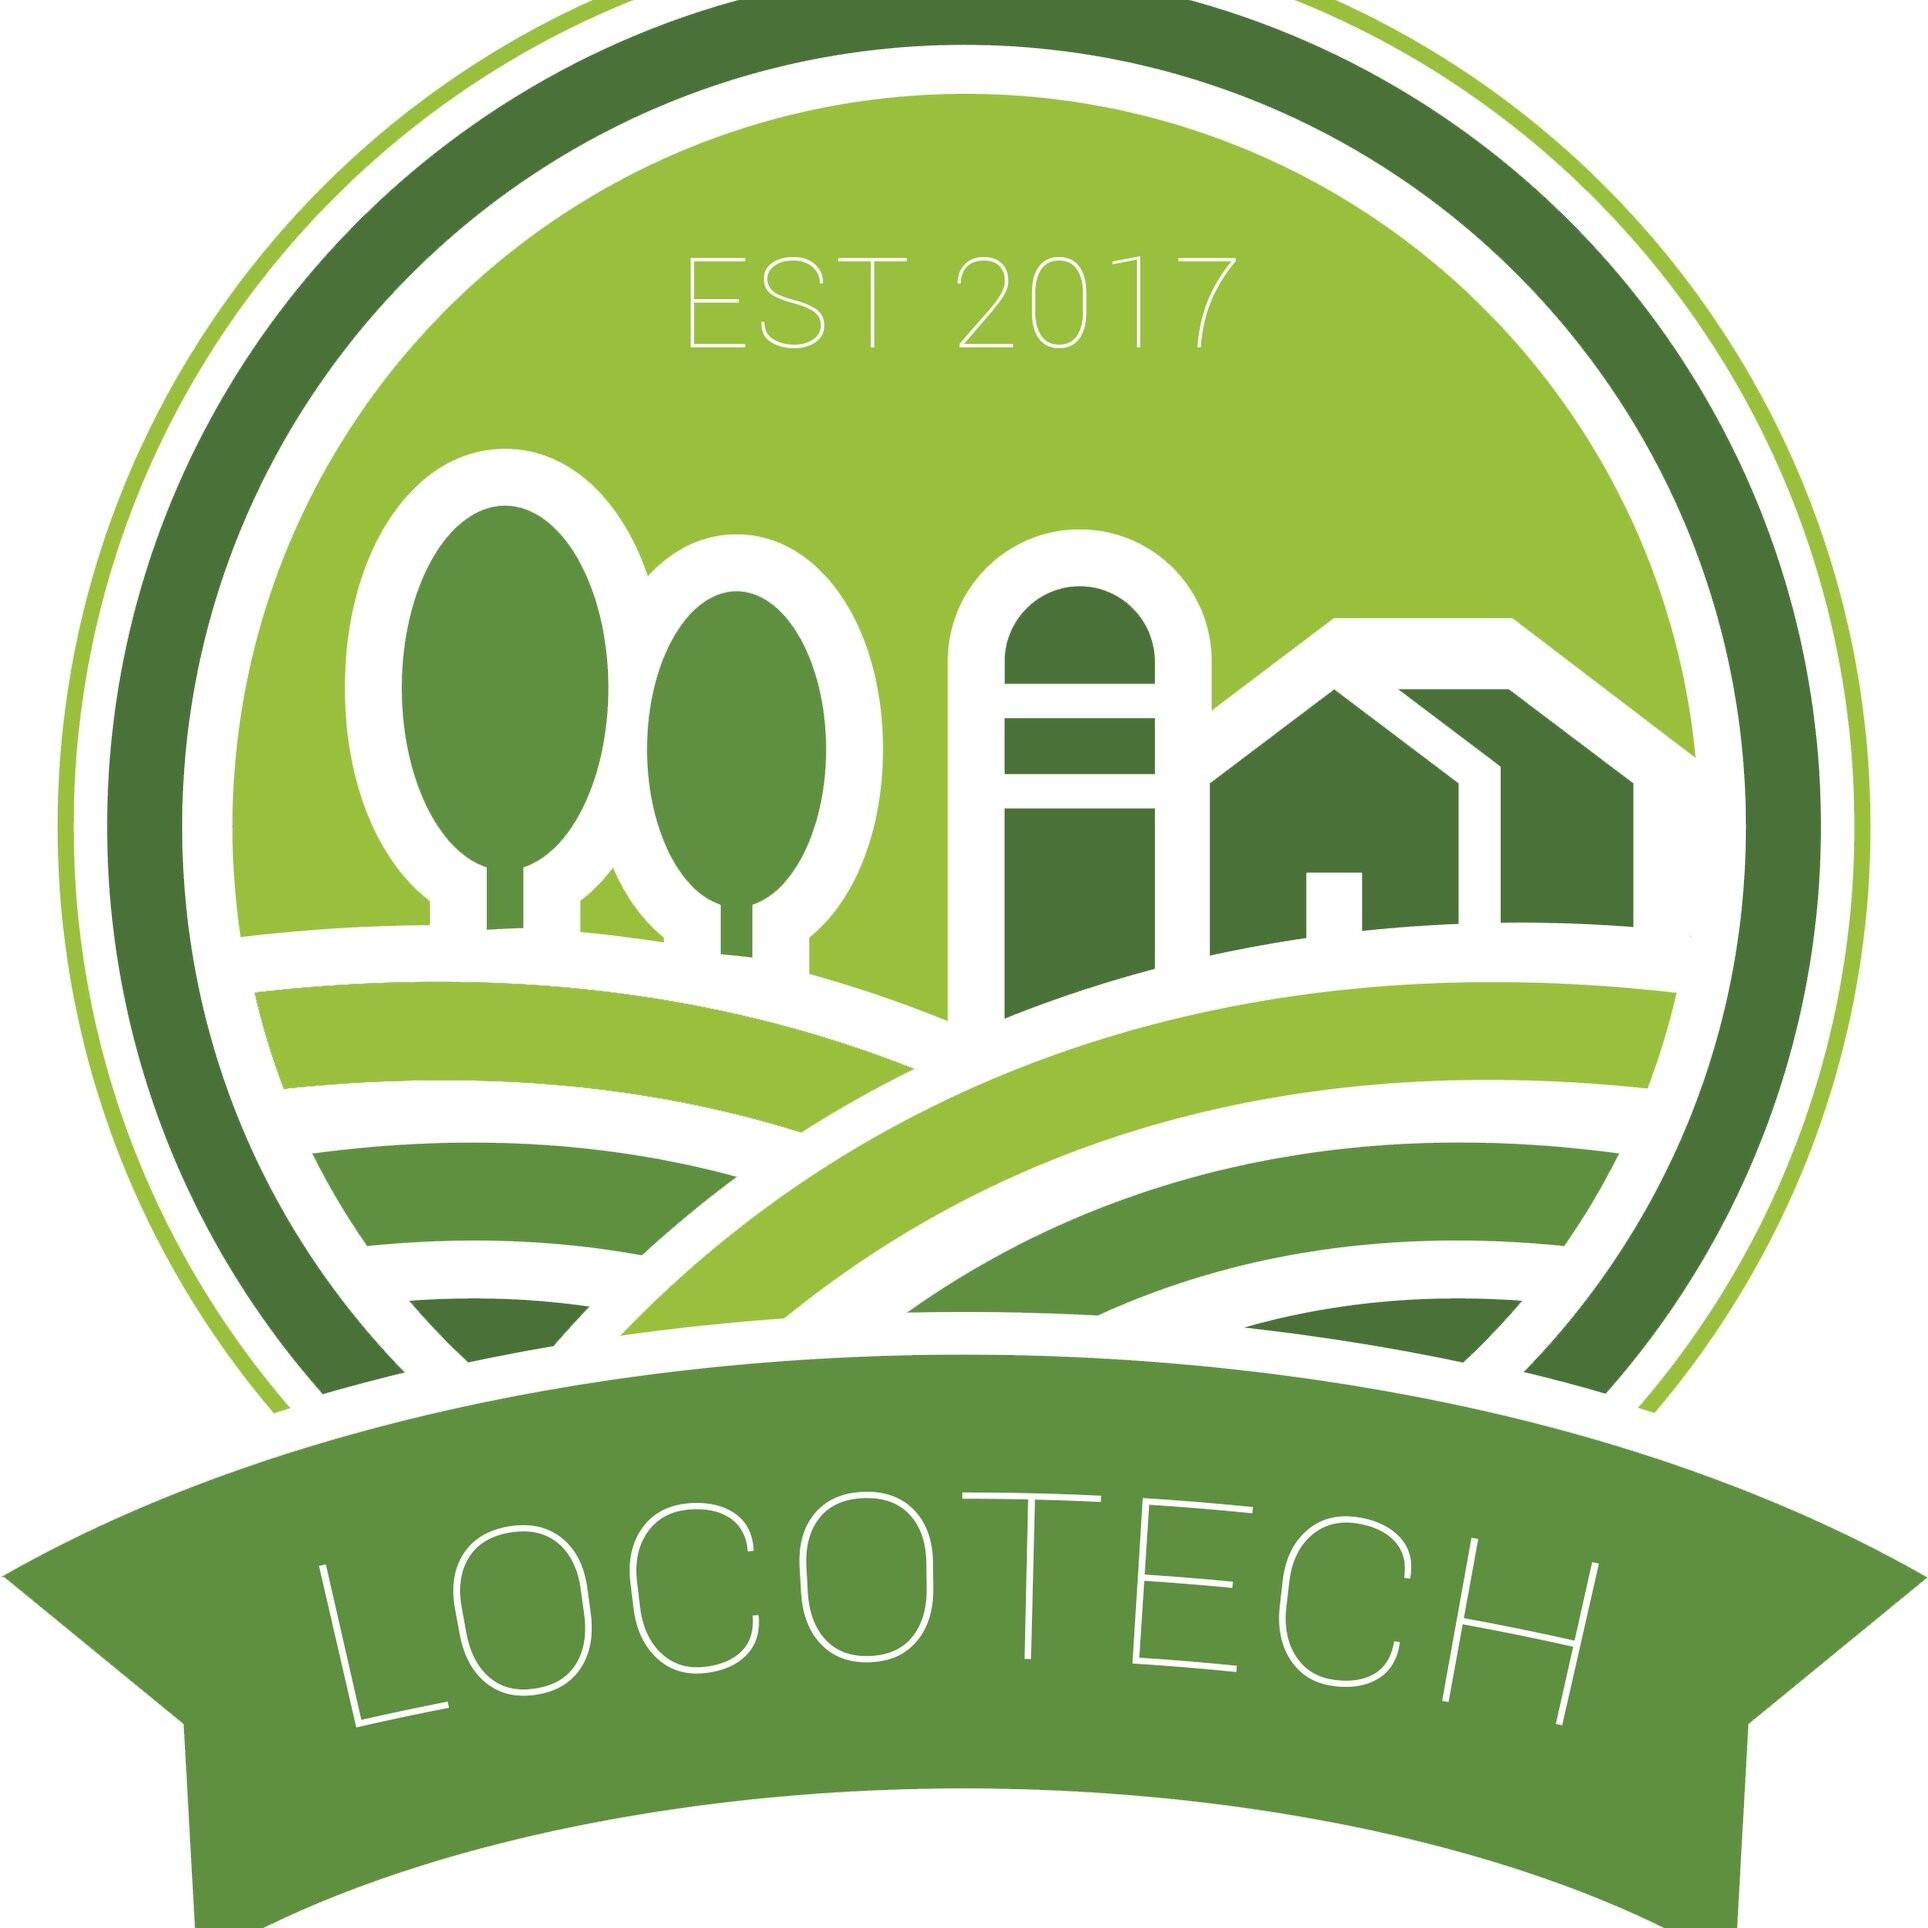 Locotech